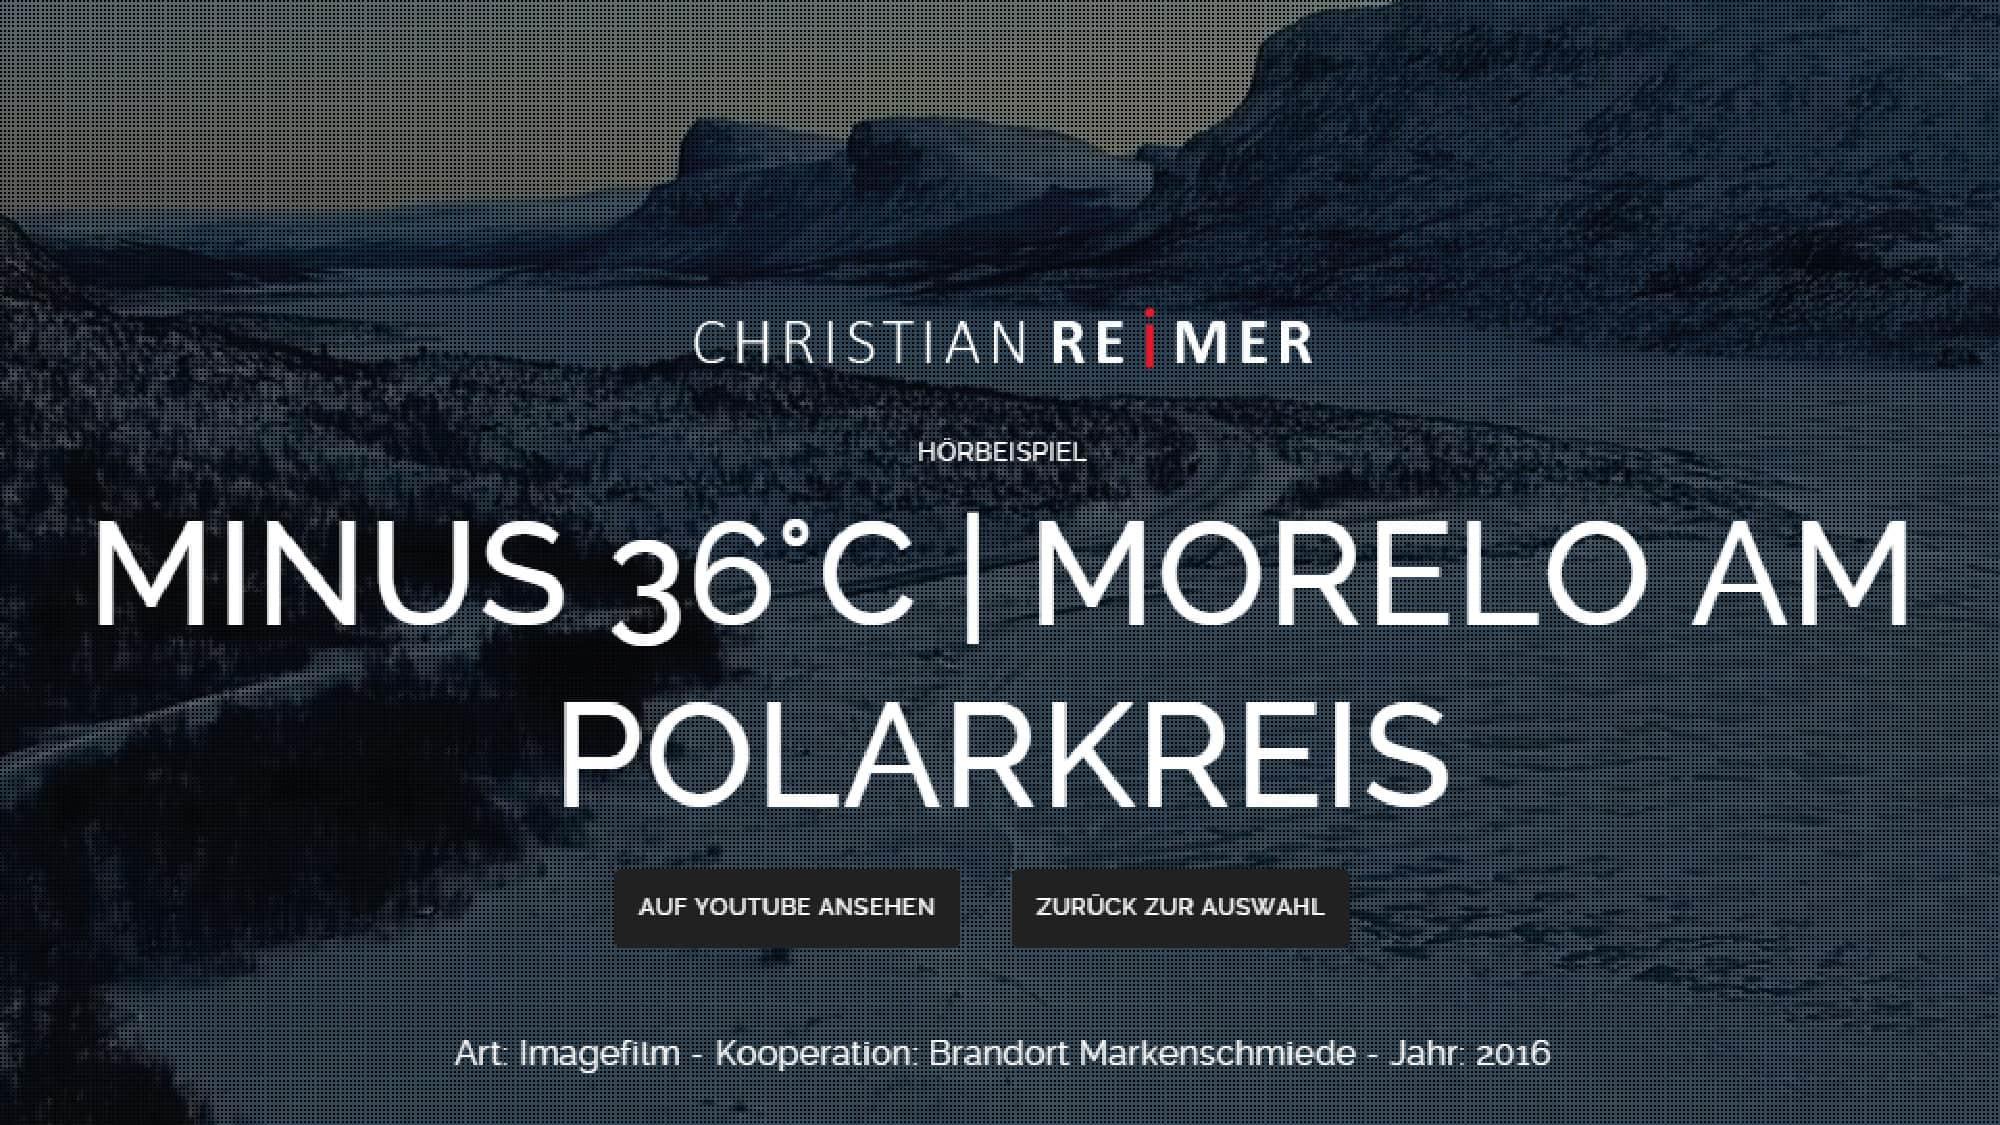 Morelo am Polarkreis. Hörbeispiel Christian Reimer